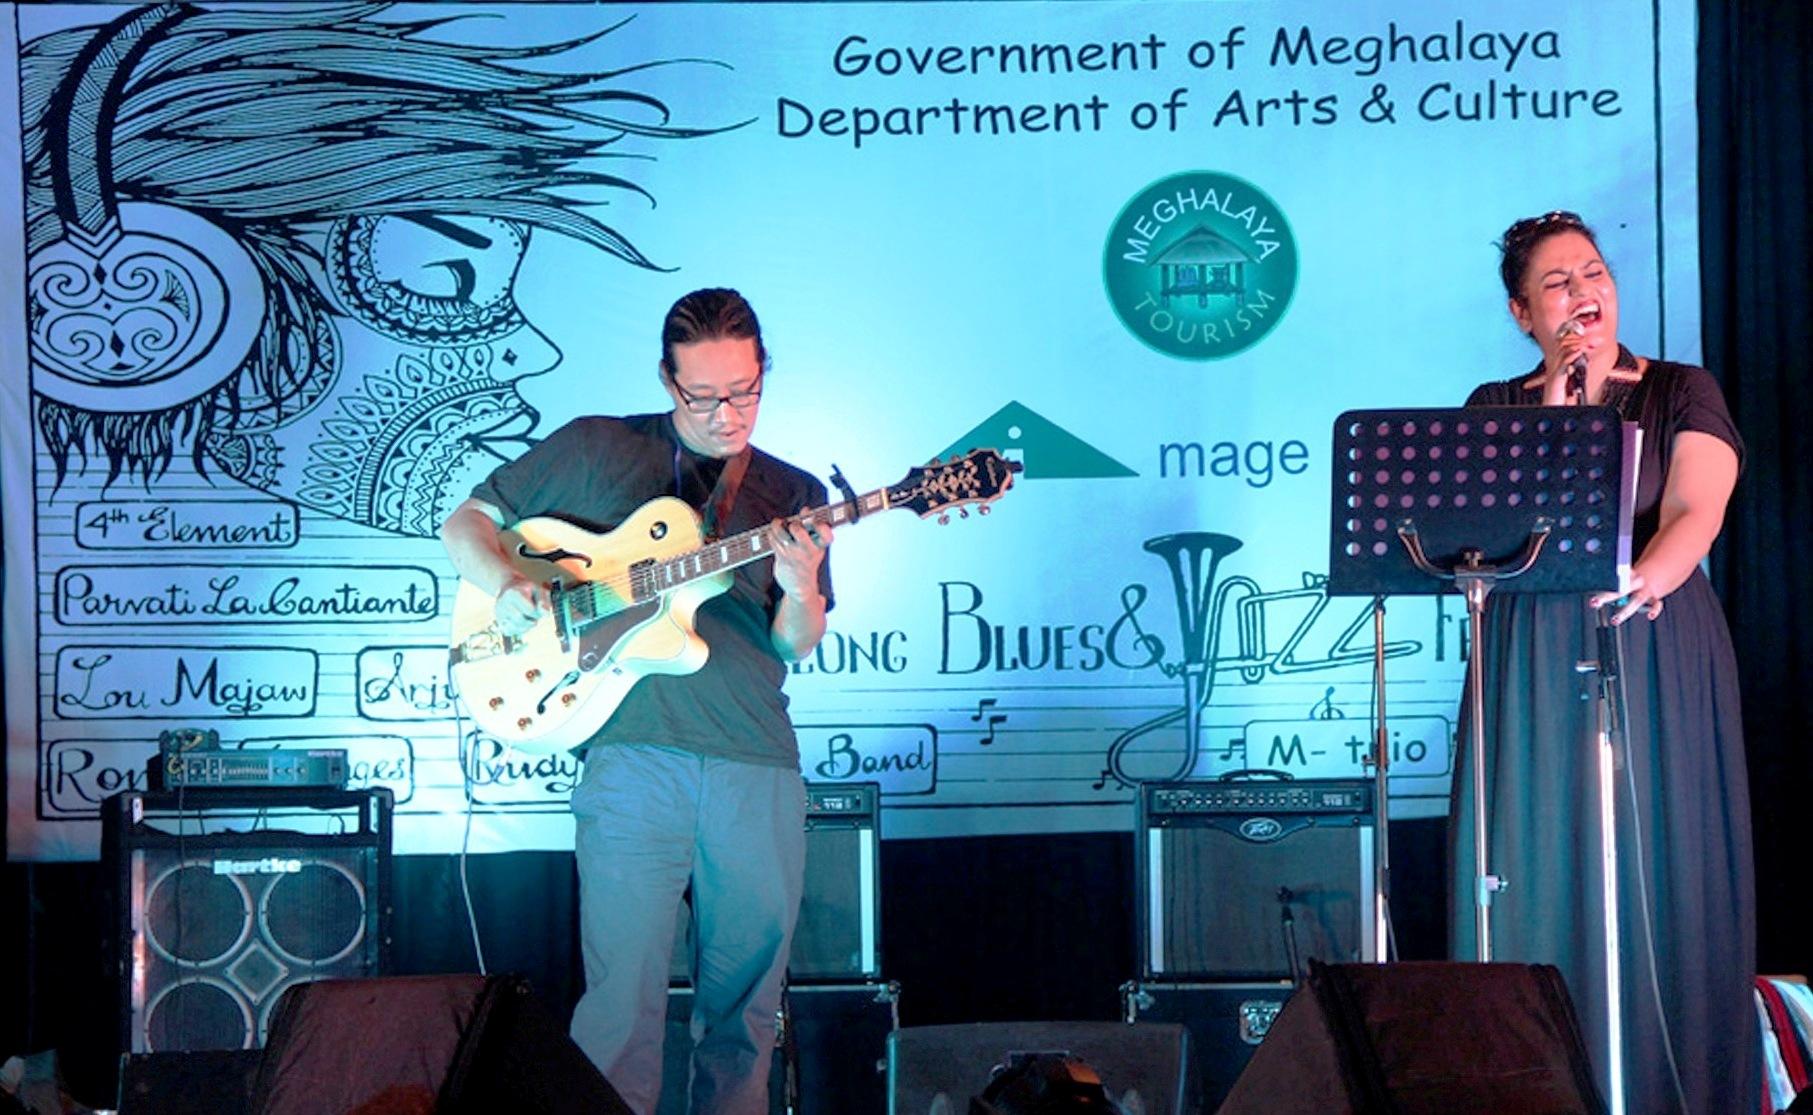 Parvati La Cantante from Delhi performing at Shillong Blues & Jazz Festival 2014